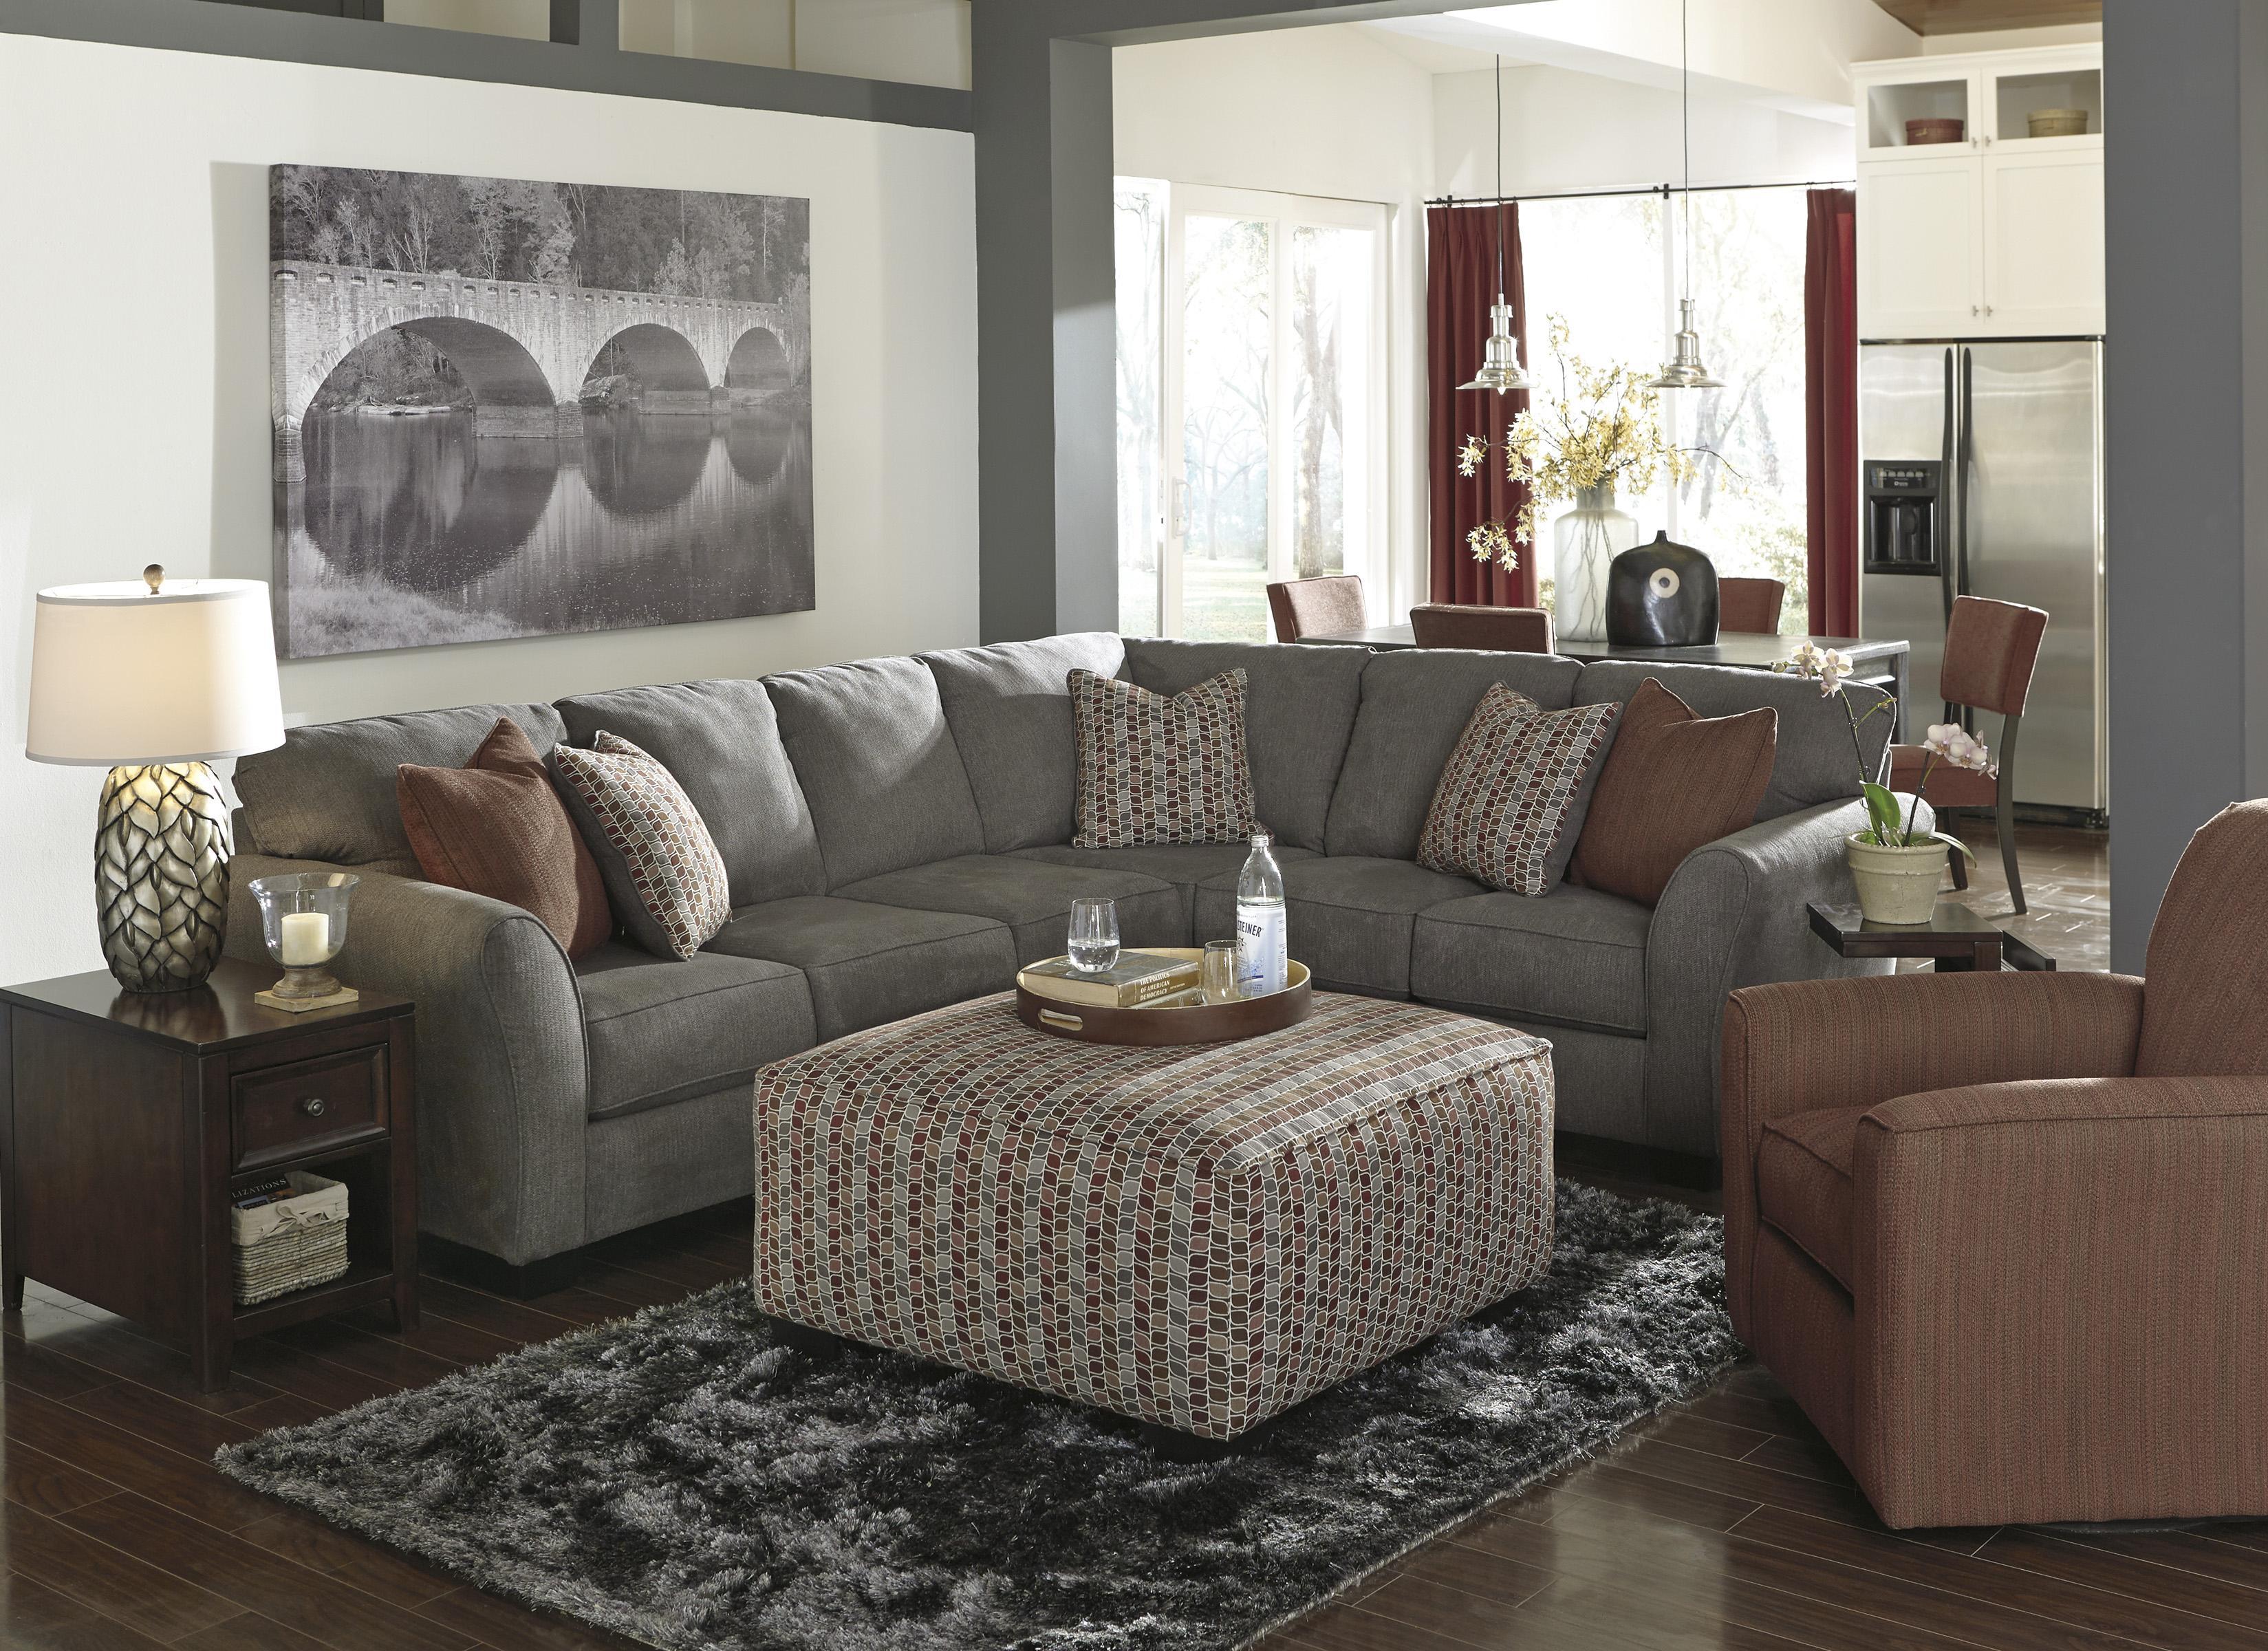 Benchcraft Doralin - Steel Stationary Living Room Group - Item Number: 86800 Living Room Group